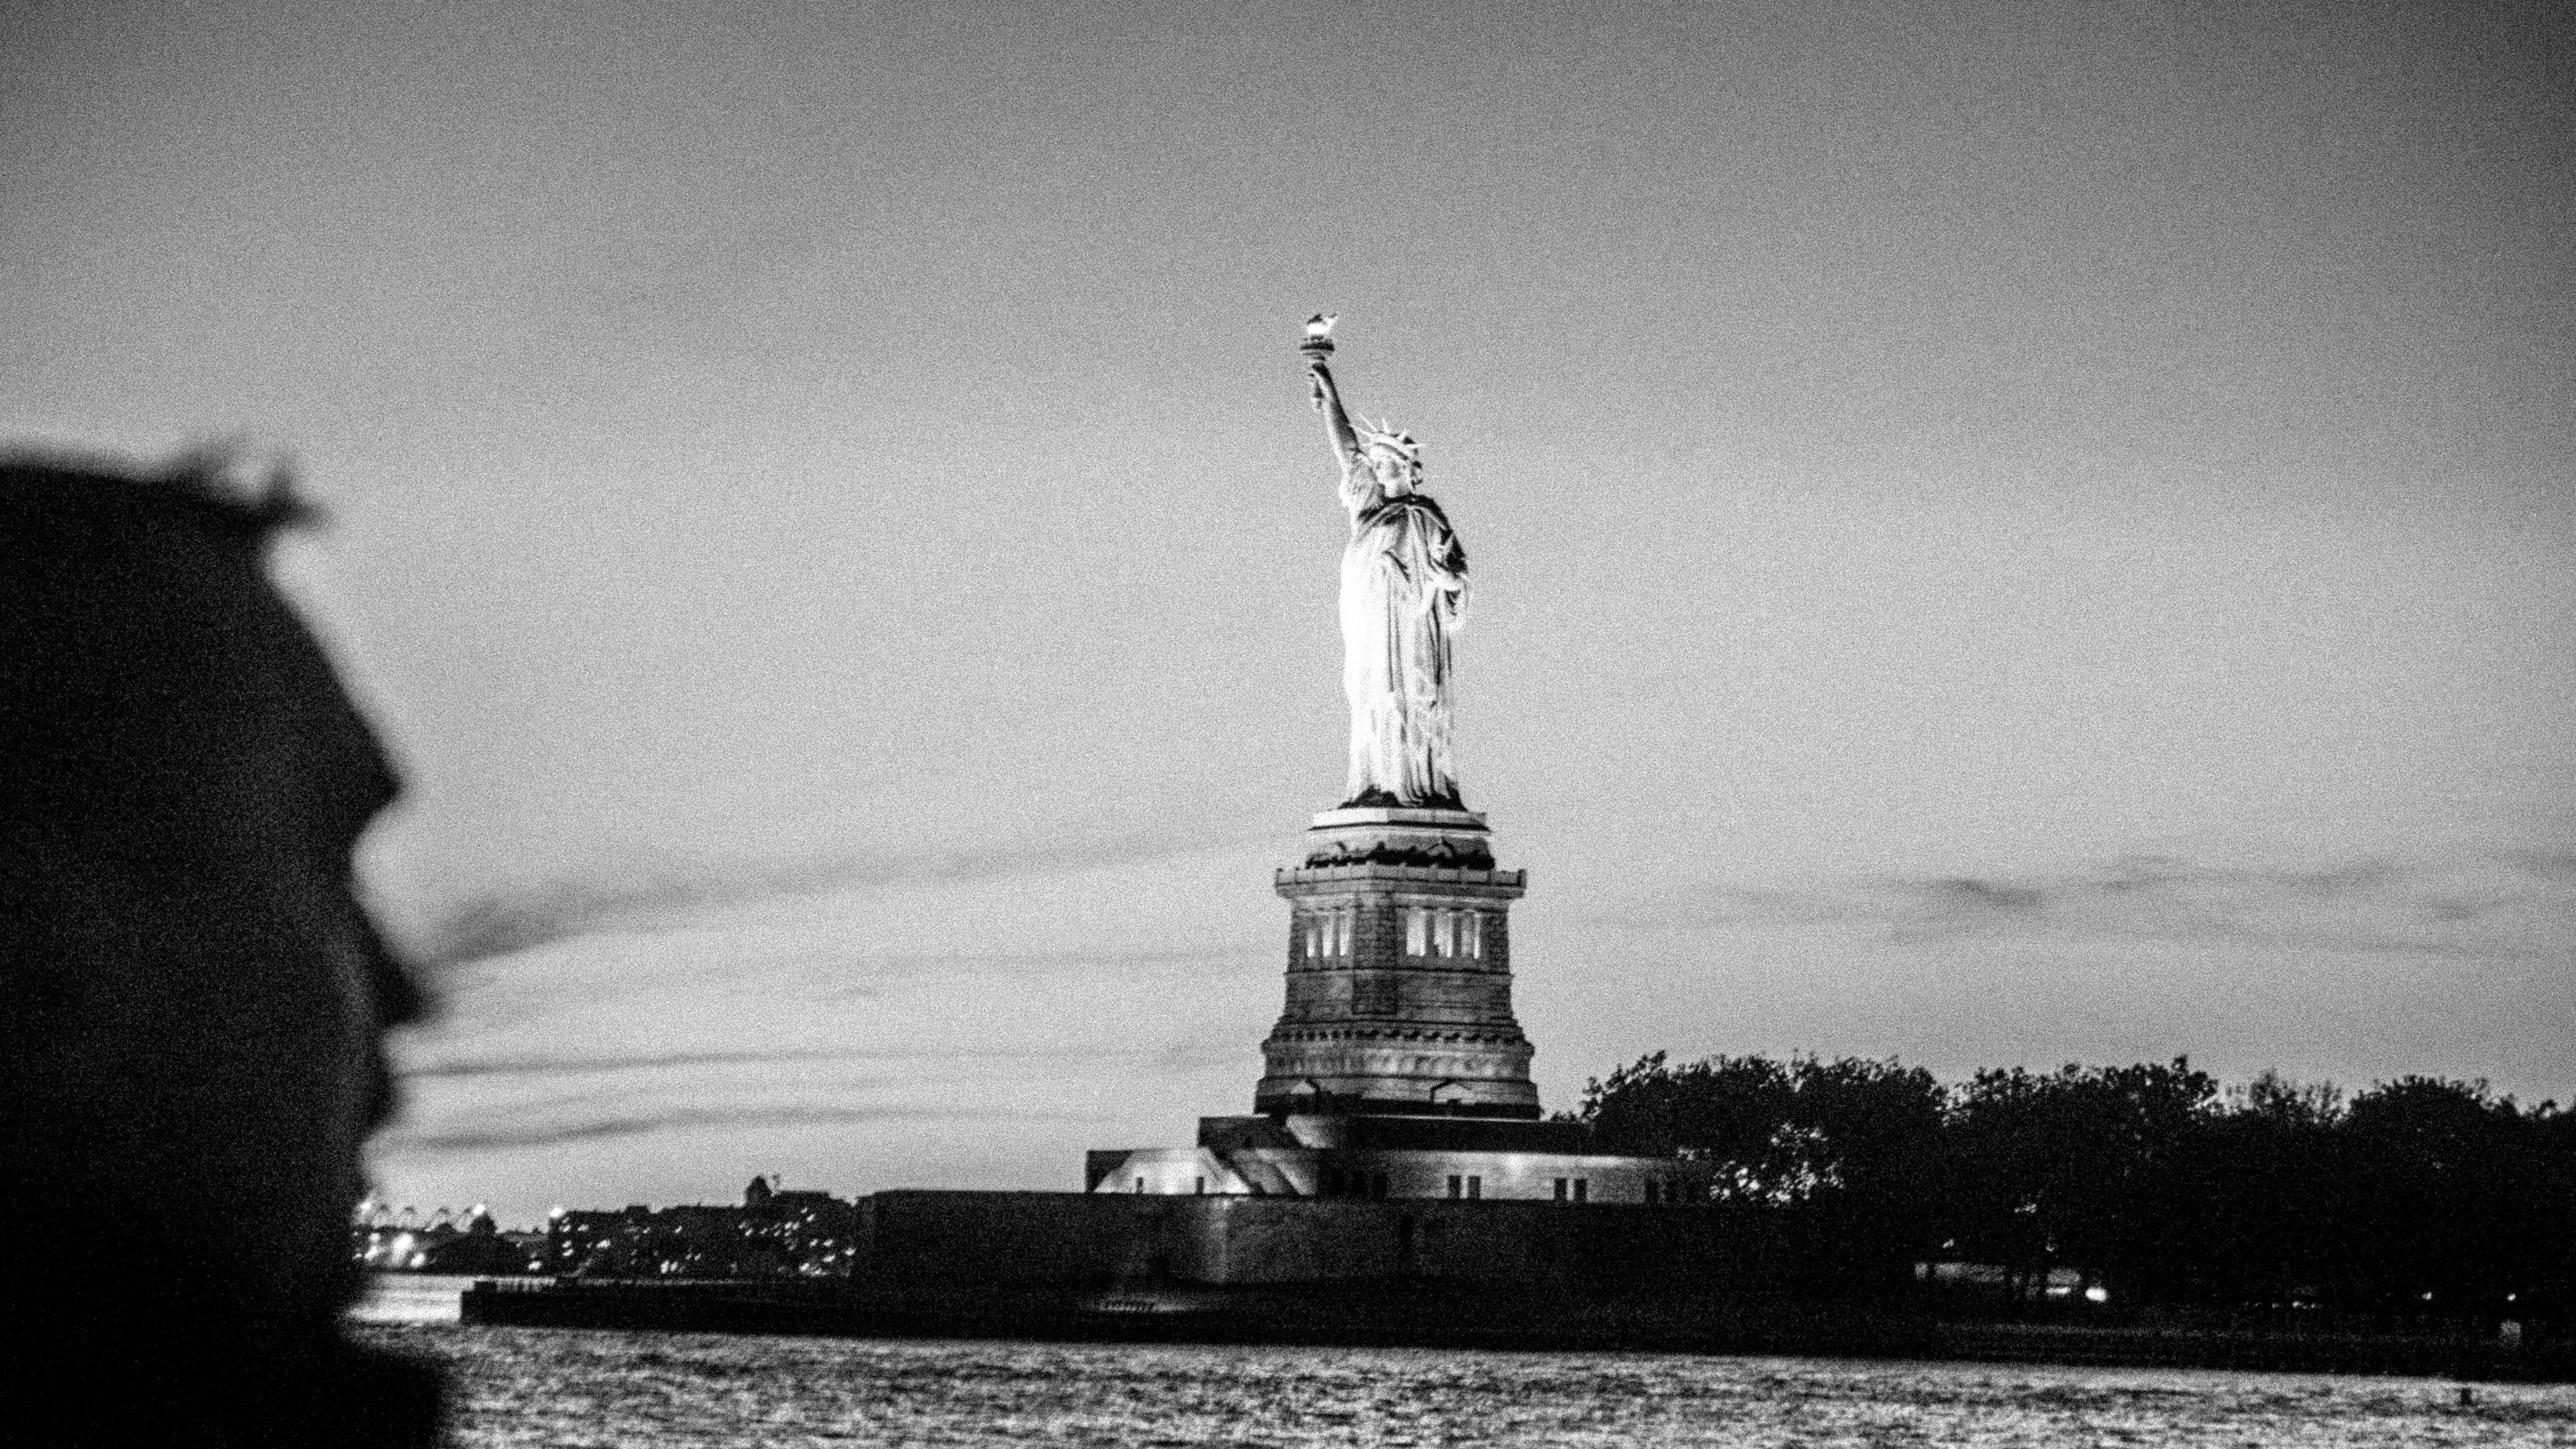 statue-of-liberty-at-sunset_t20_YXPm3x-151